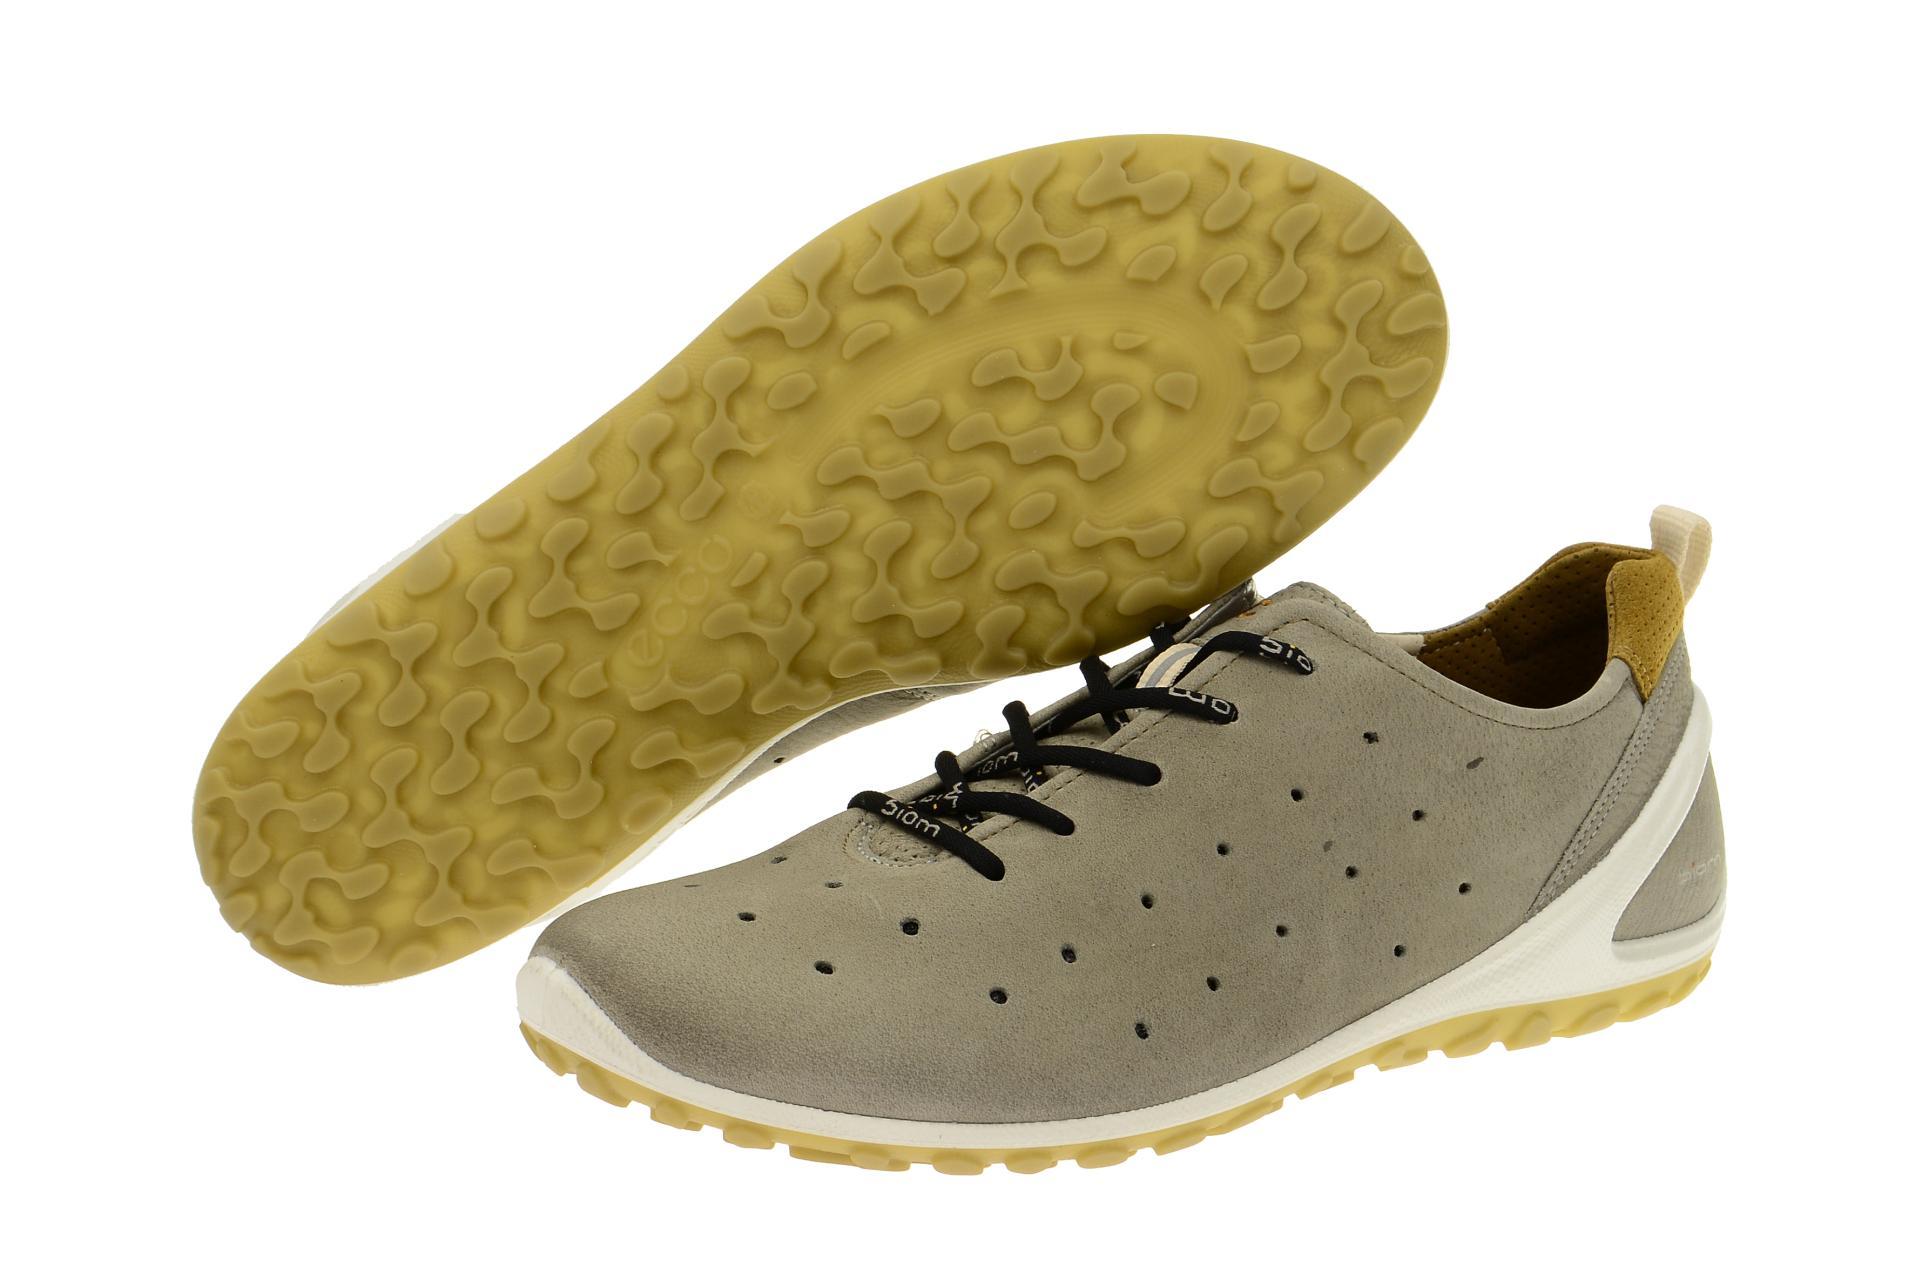 Sneakers Ecco Schuhe 1 80200459911 Lite Biom 2 Grau Neu Herrenschuhe QtsrdChx